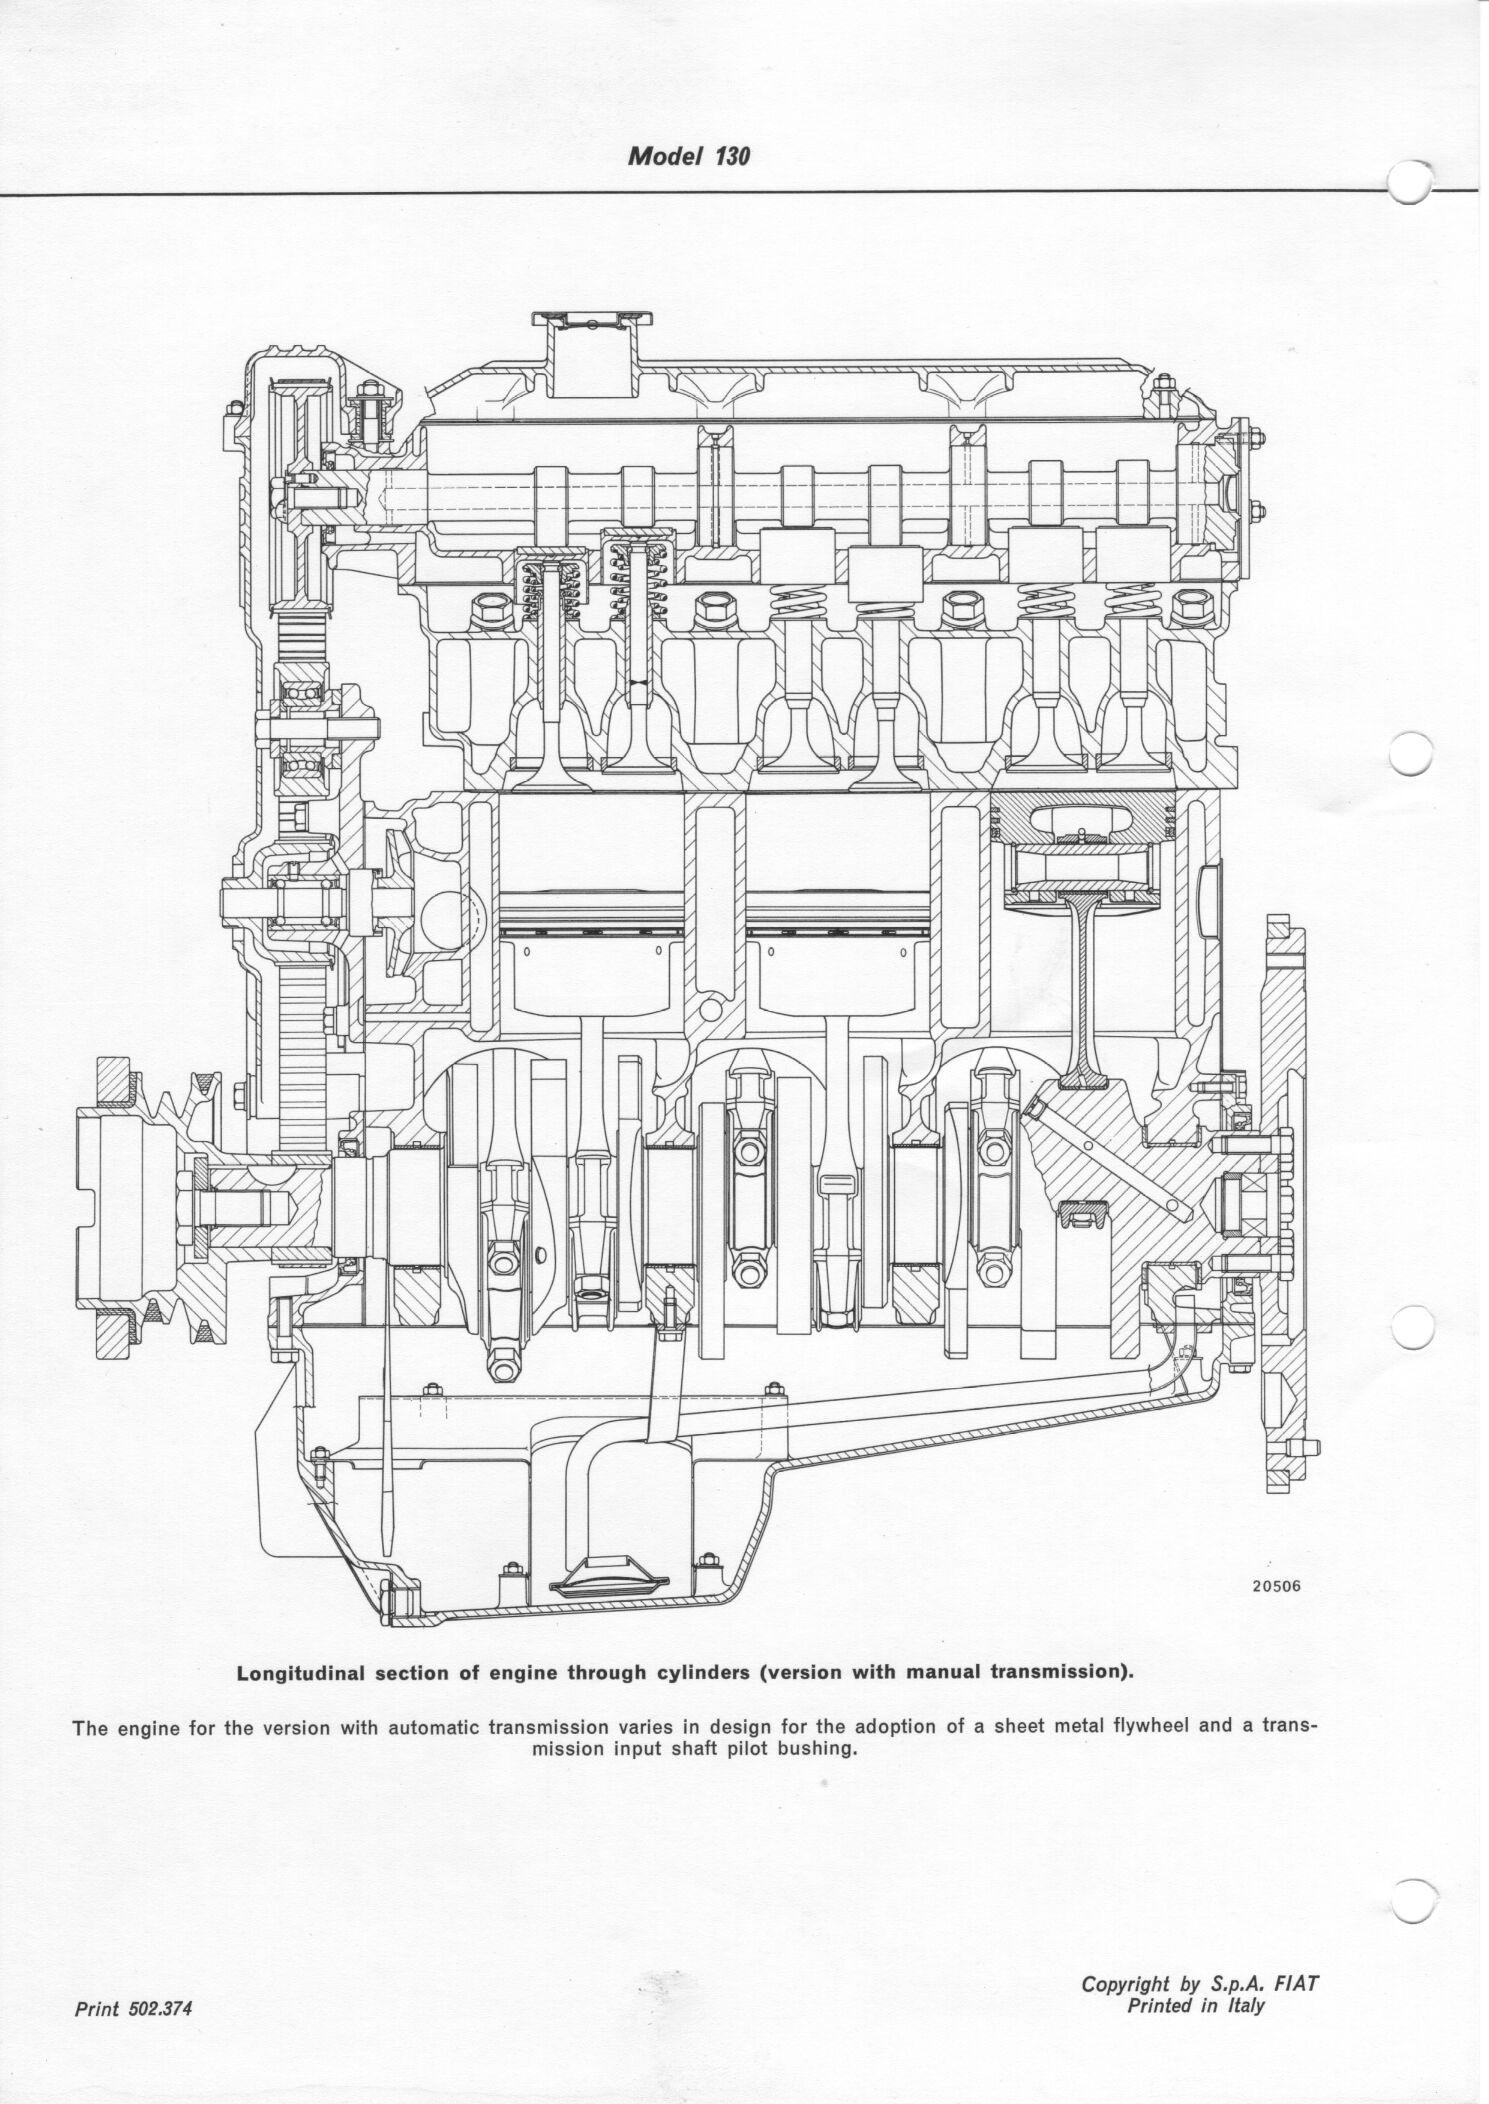 fiat 130 engine manual fiat 130 heaven diagram fiat manual fiat engine schematics [ 1489 x 2104 Pixel ]